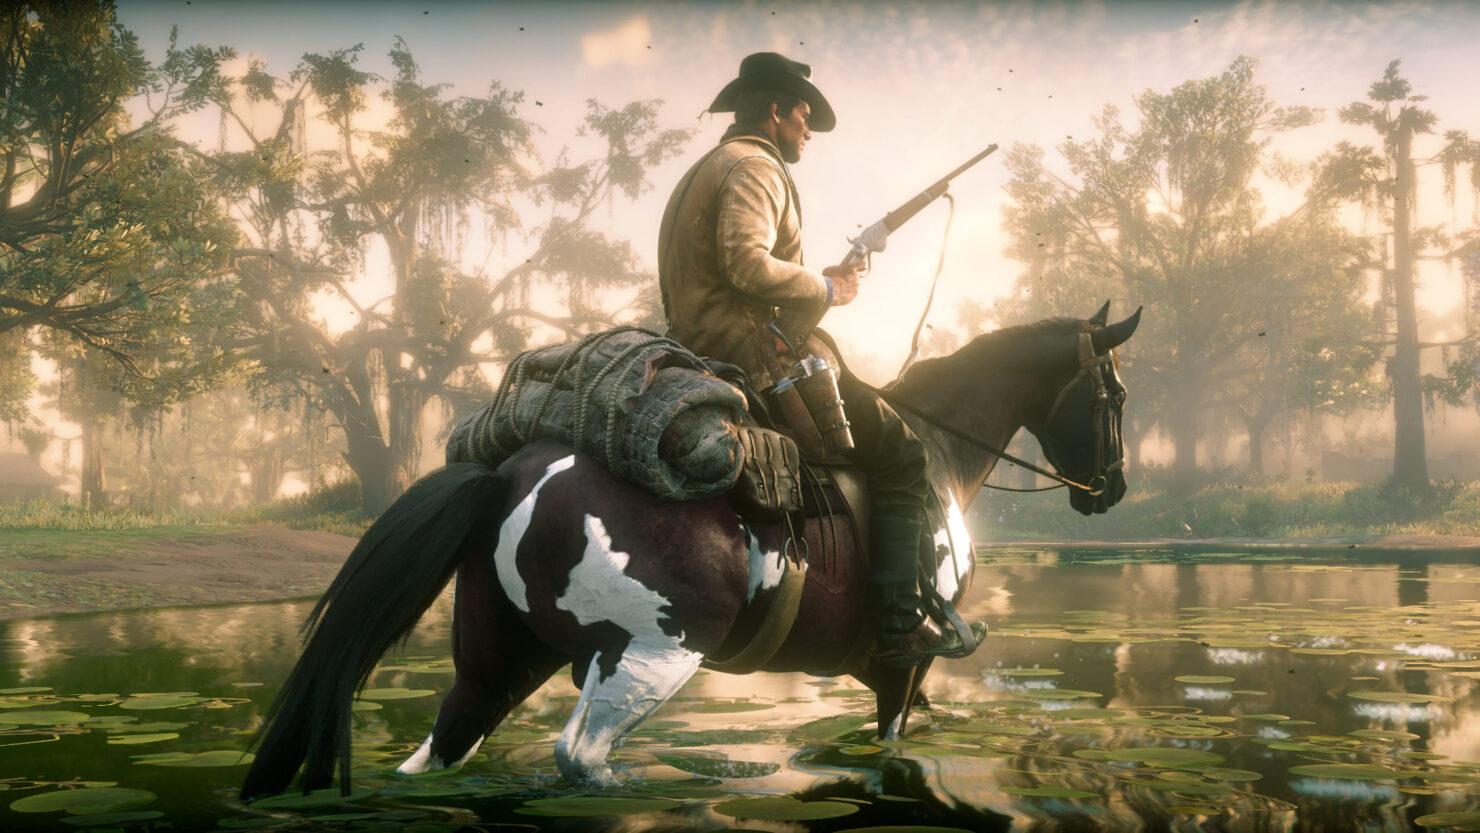 Red Dead Redemption 2 sales